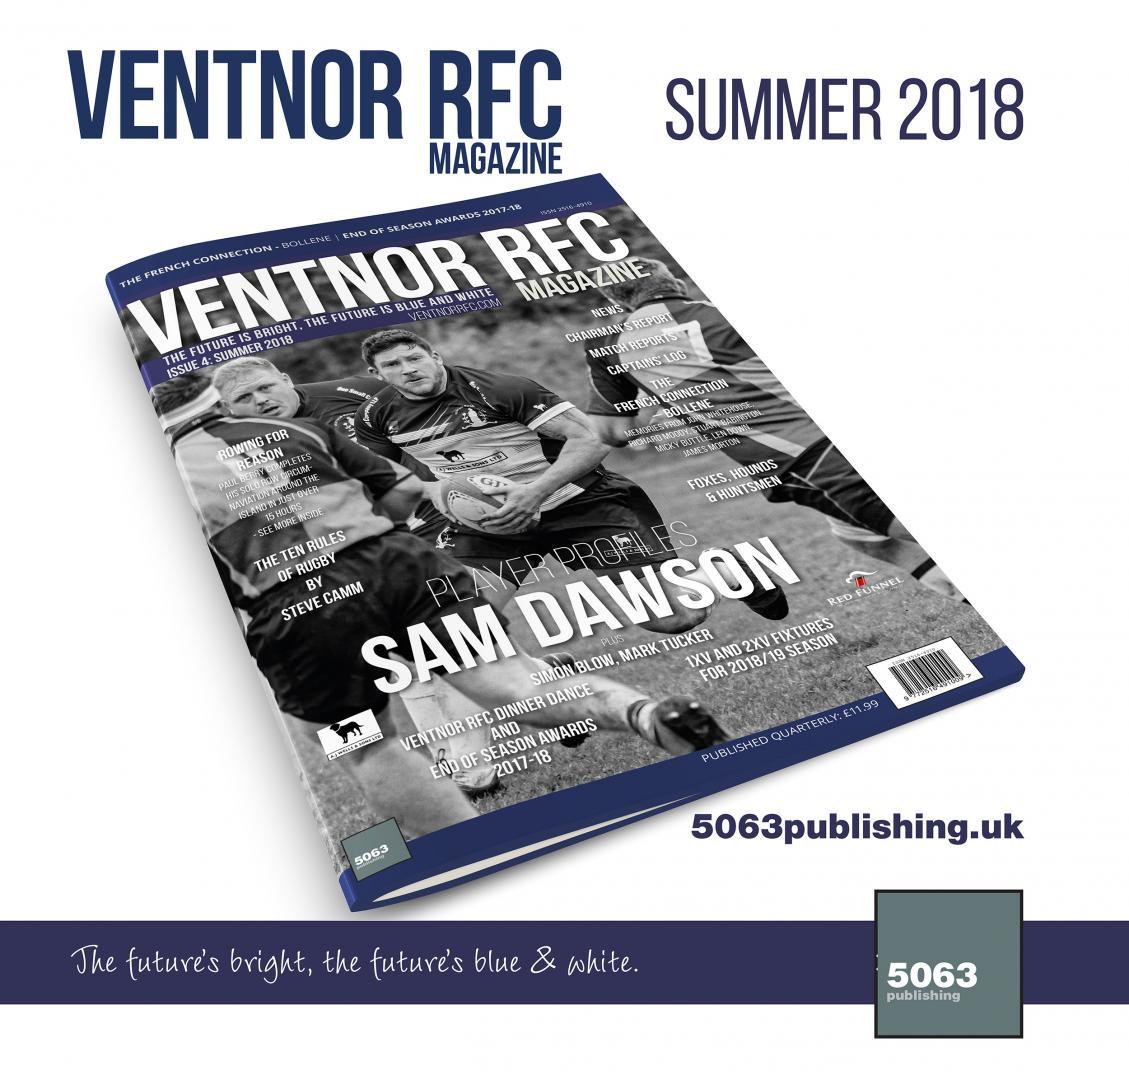 ventnor-rfc-magazine-summer-2018-mockup-1